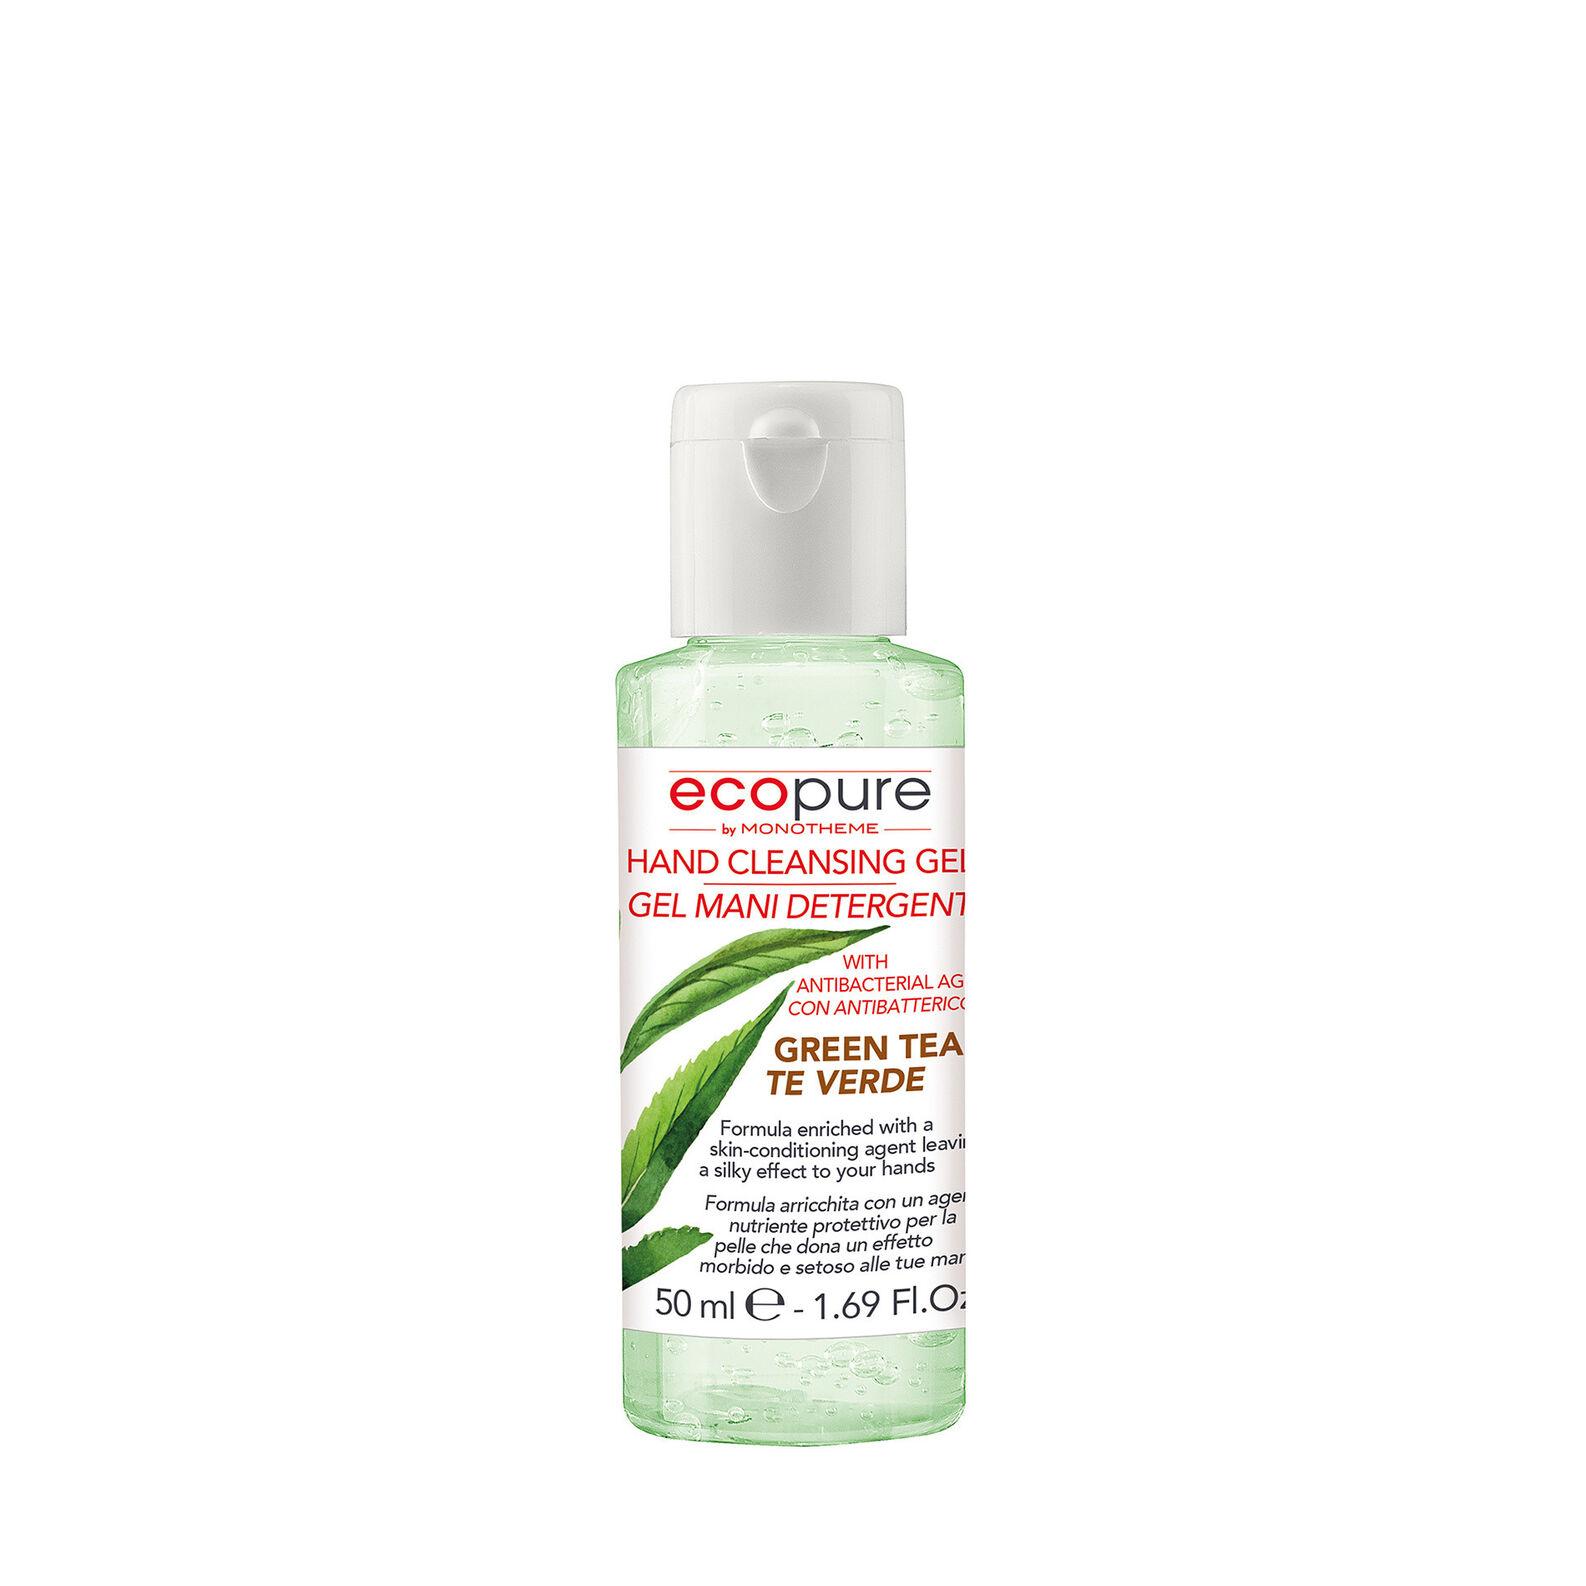 Green tea hand gel Ecopure by Monotheme 50ml